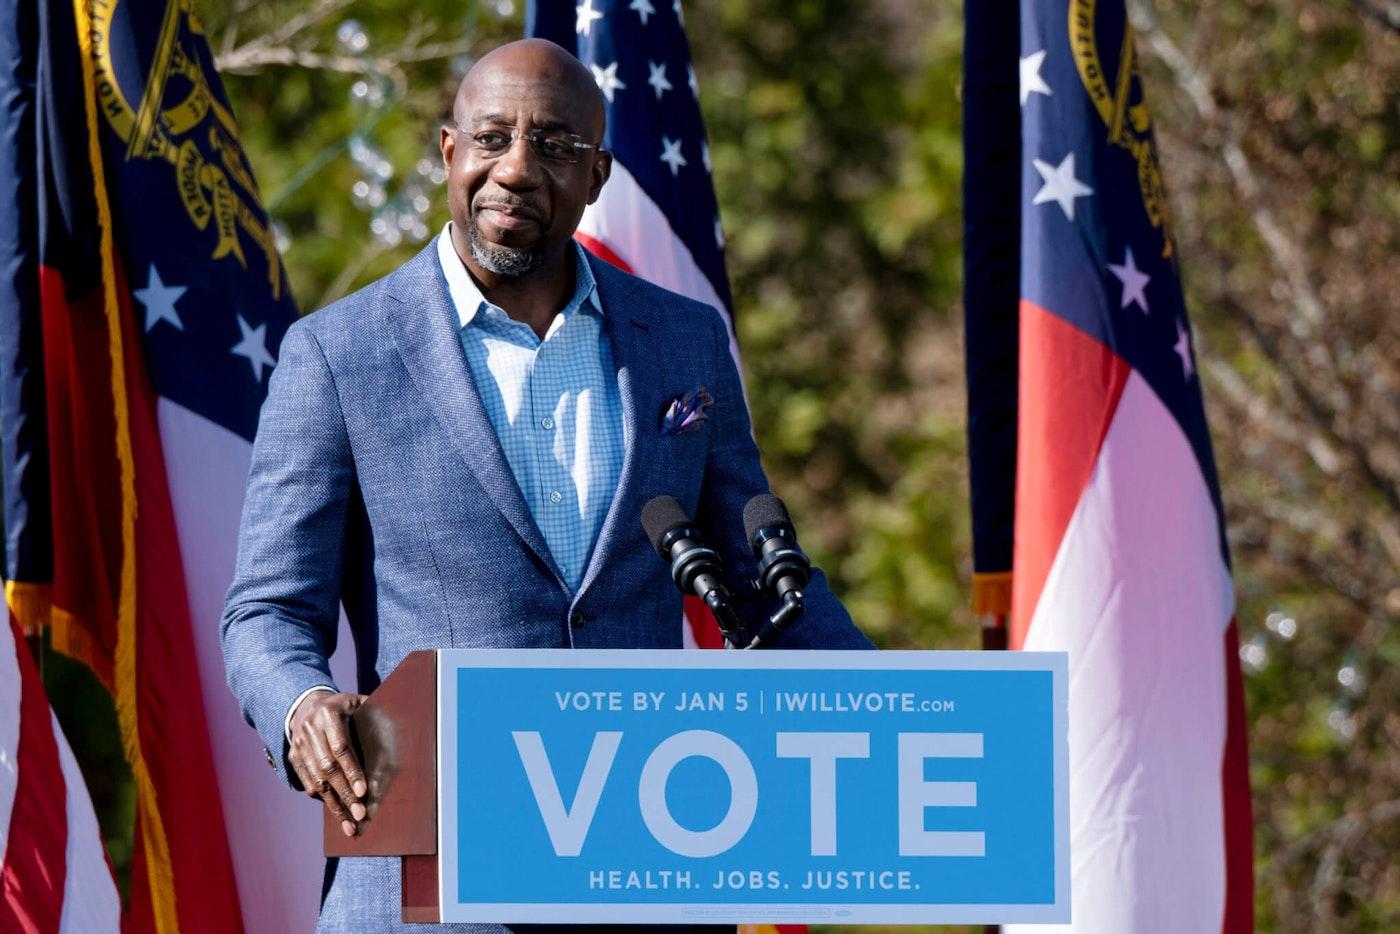 Georgia elected its first Black senator this week when Rev. Raphael Warnock defeated Kelly Loeffler in a special Georgia Senate runoff election. (AP Photo/Ben Gray, File)